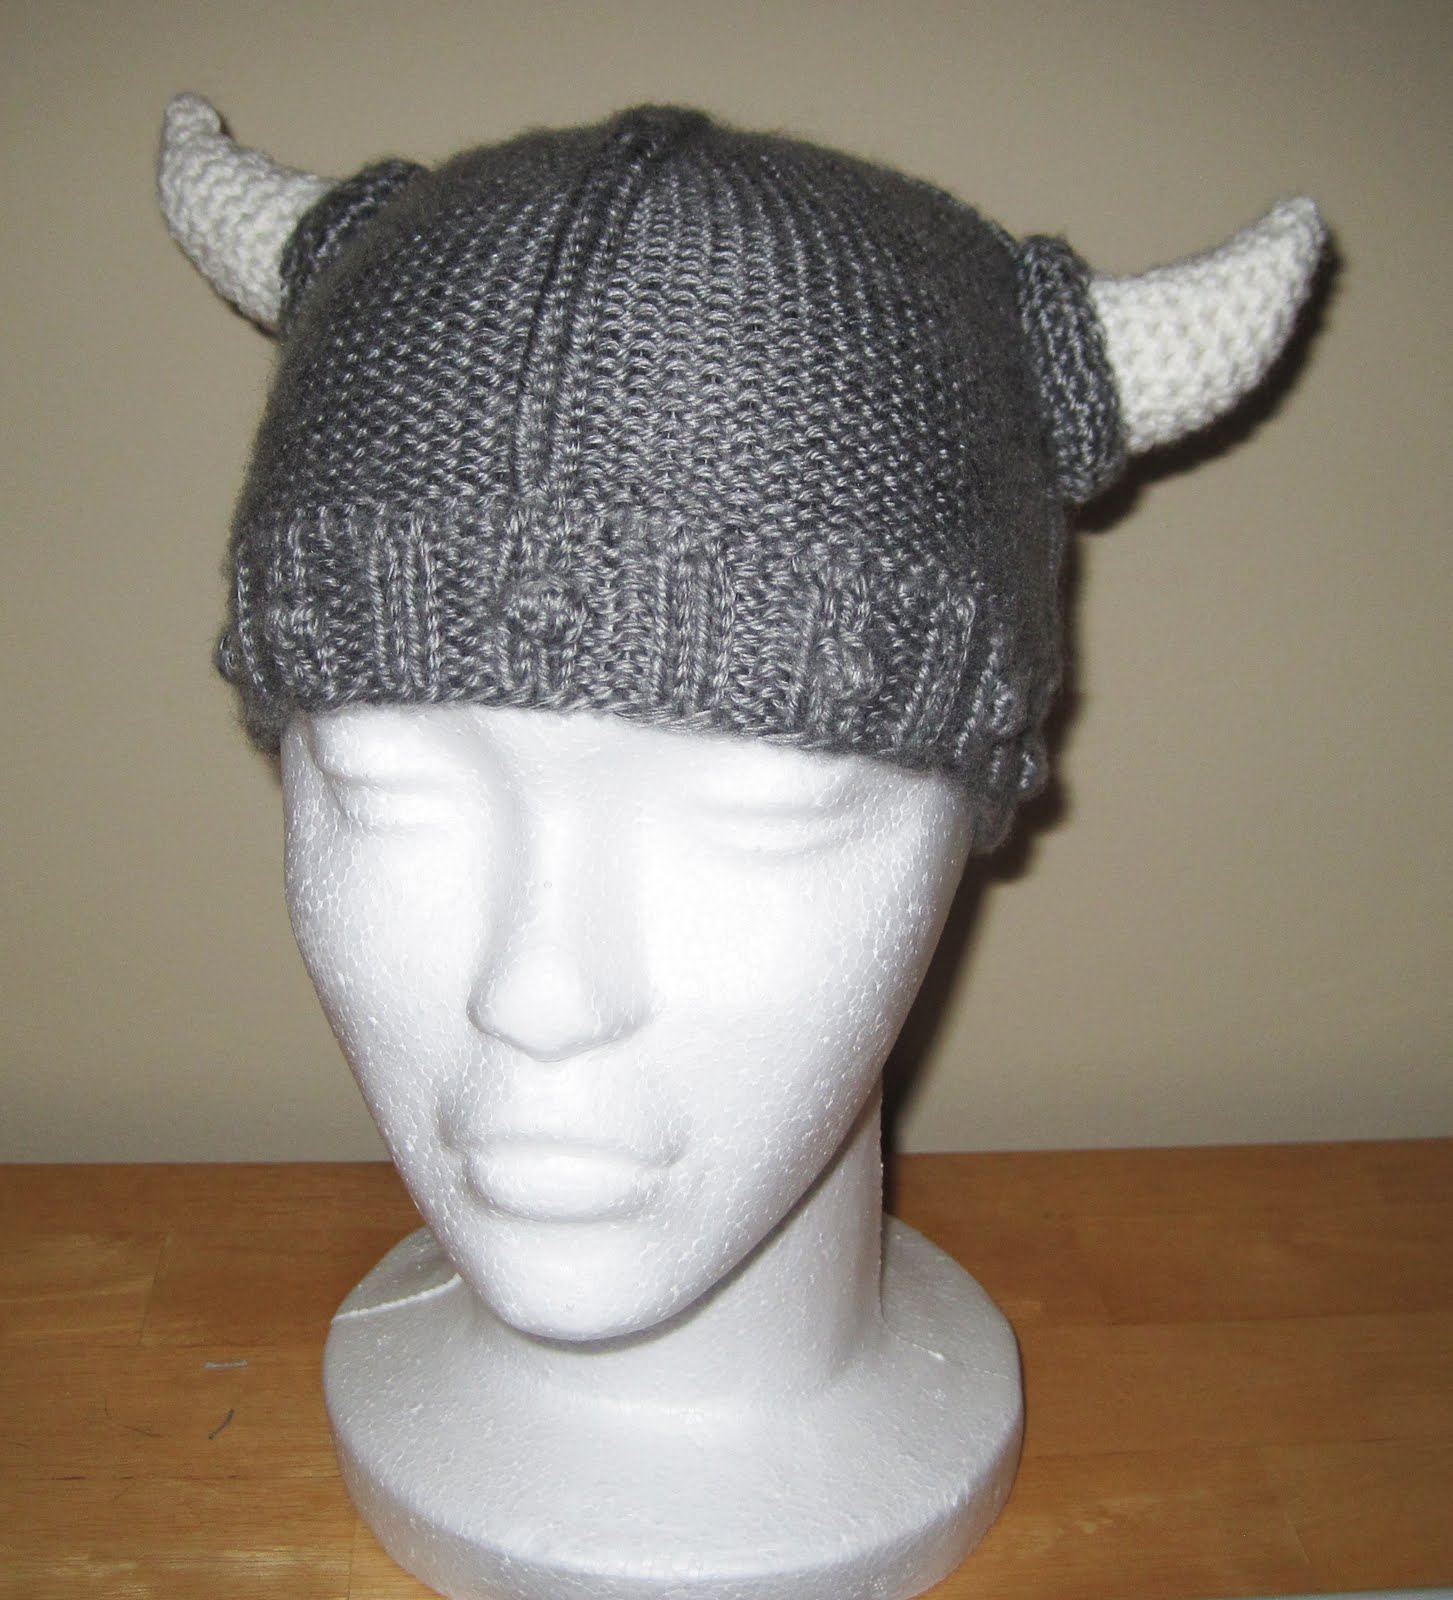 Crochet Adult Helmet Hat Patterns Crochet Patterns